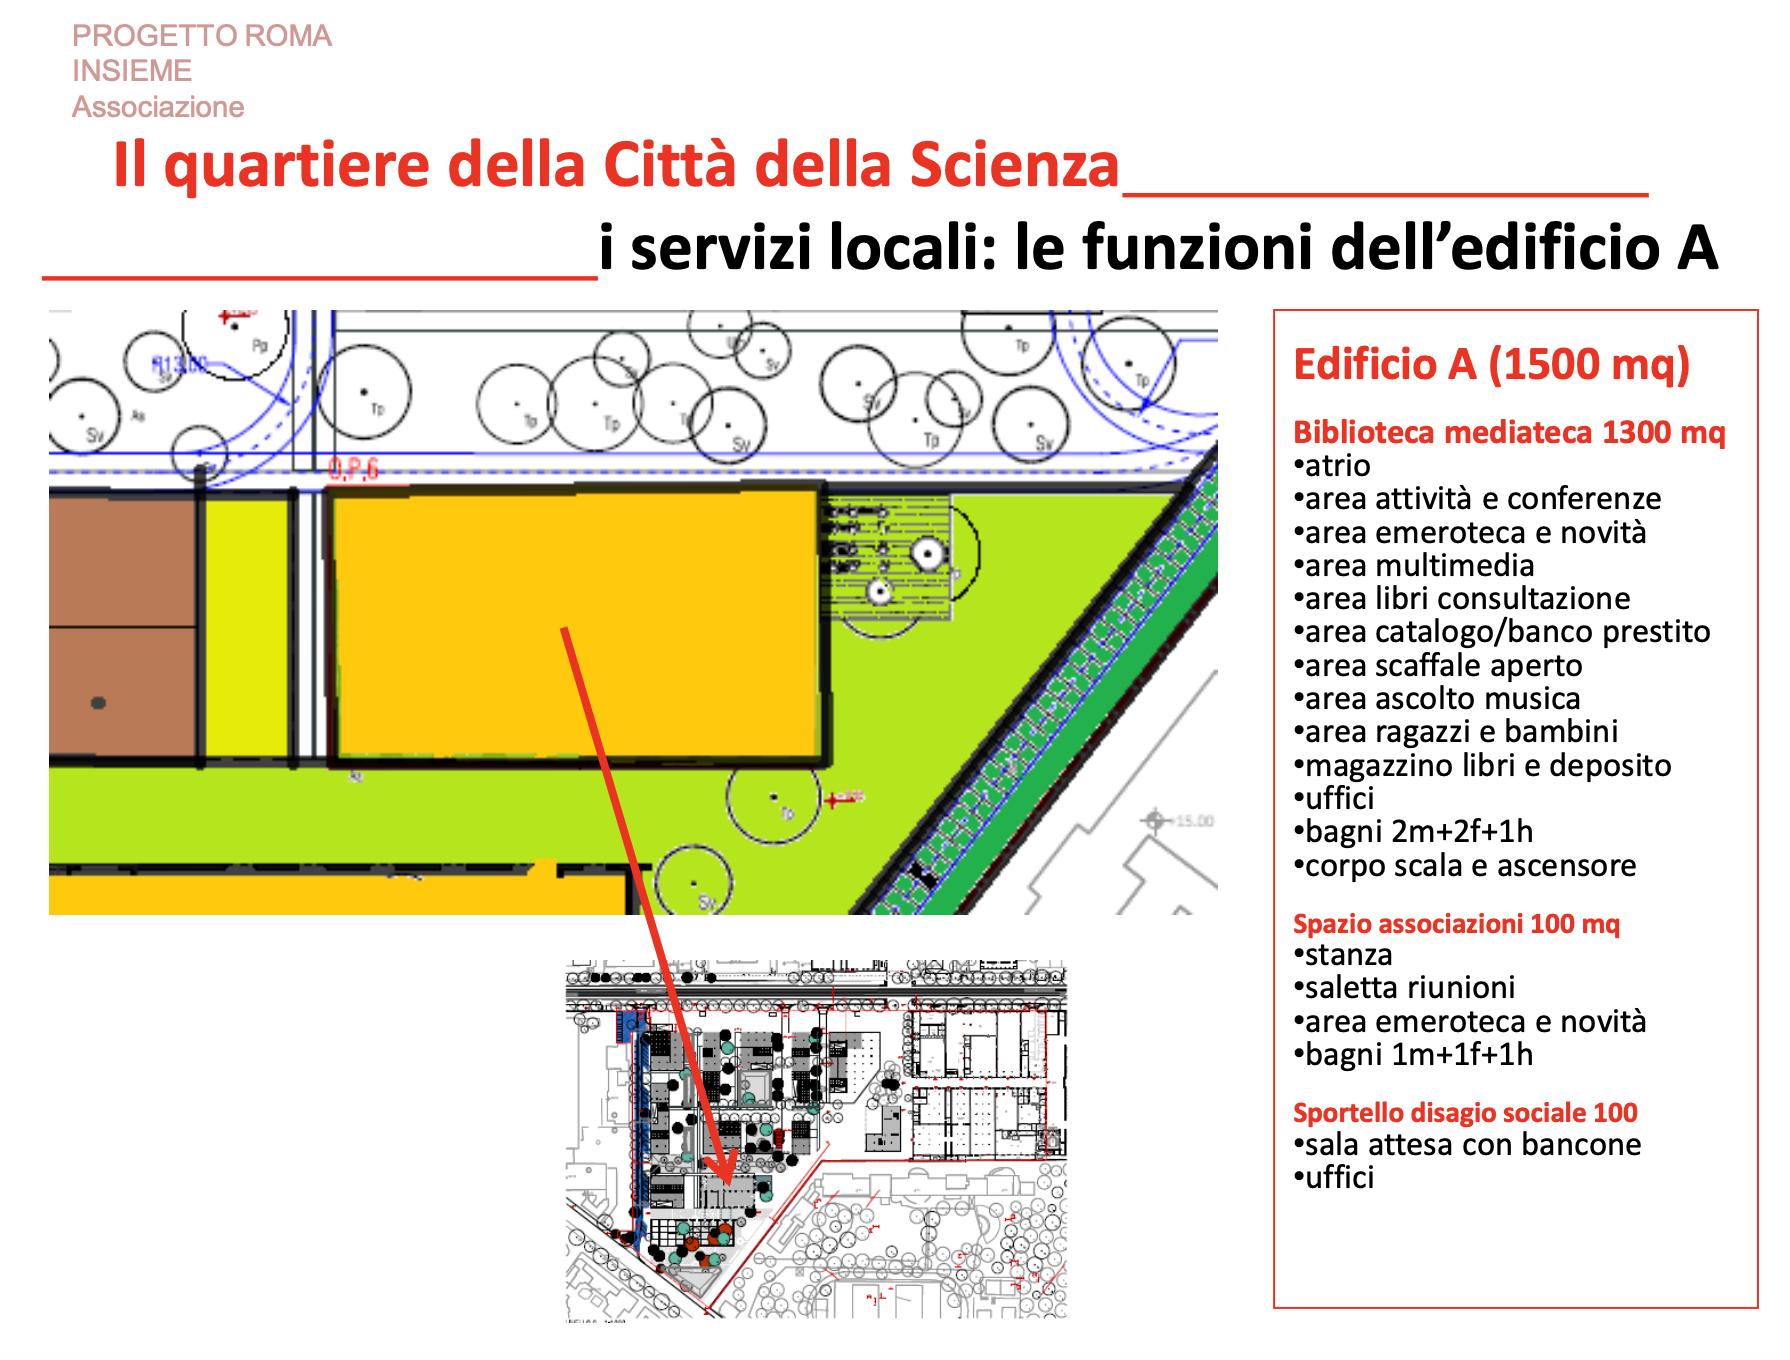 proposte casa quartiere (slide ass roma insieme 1)